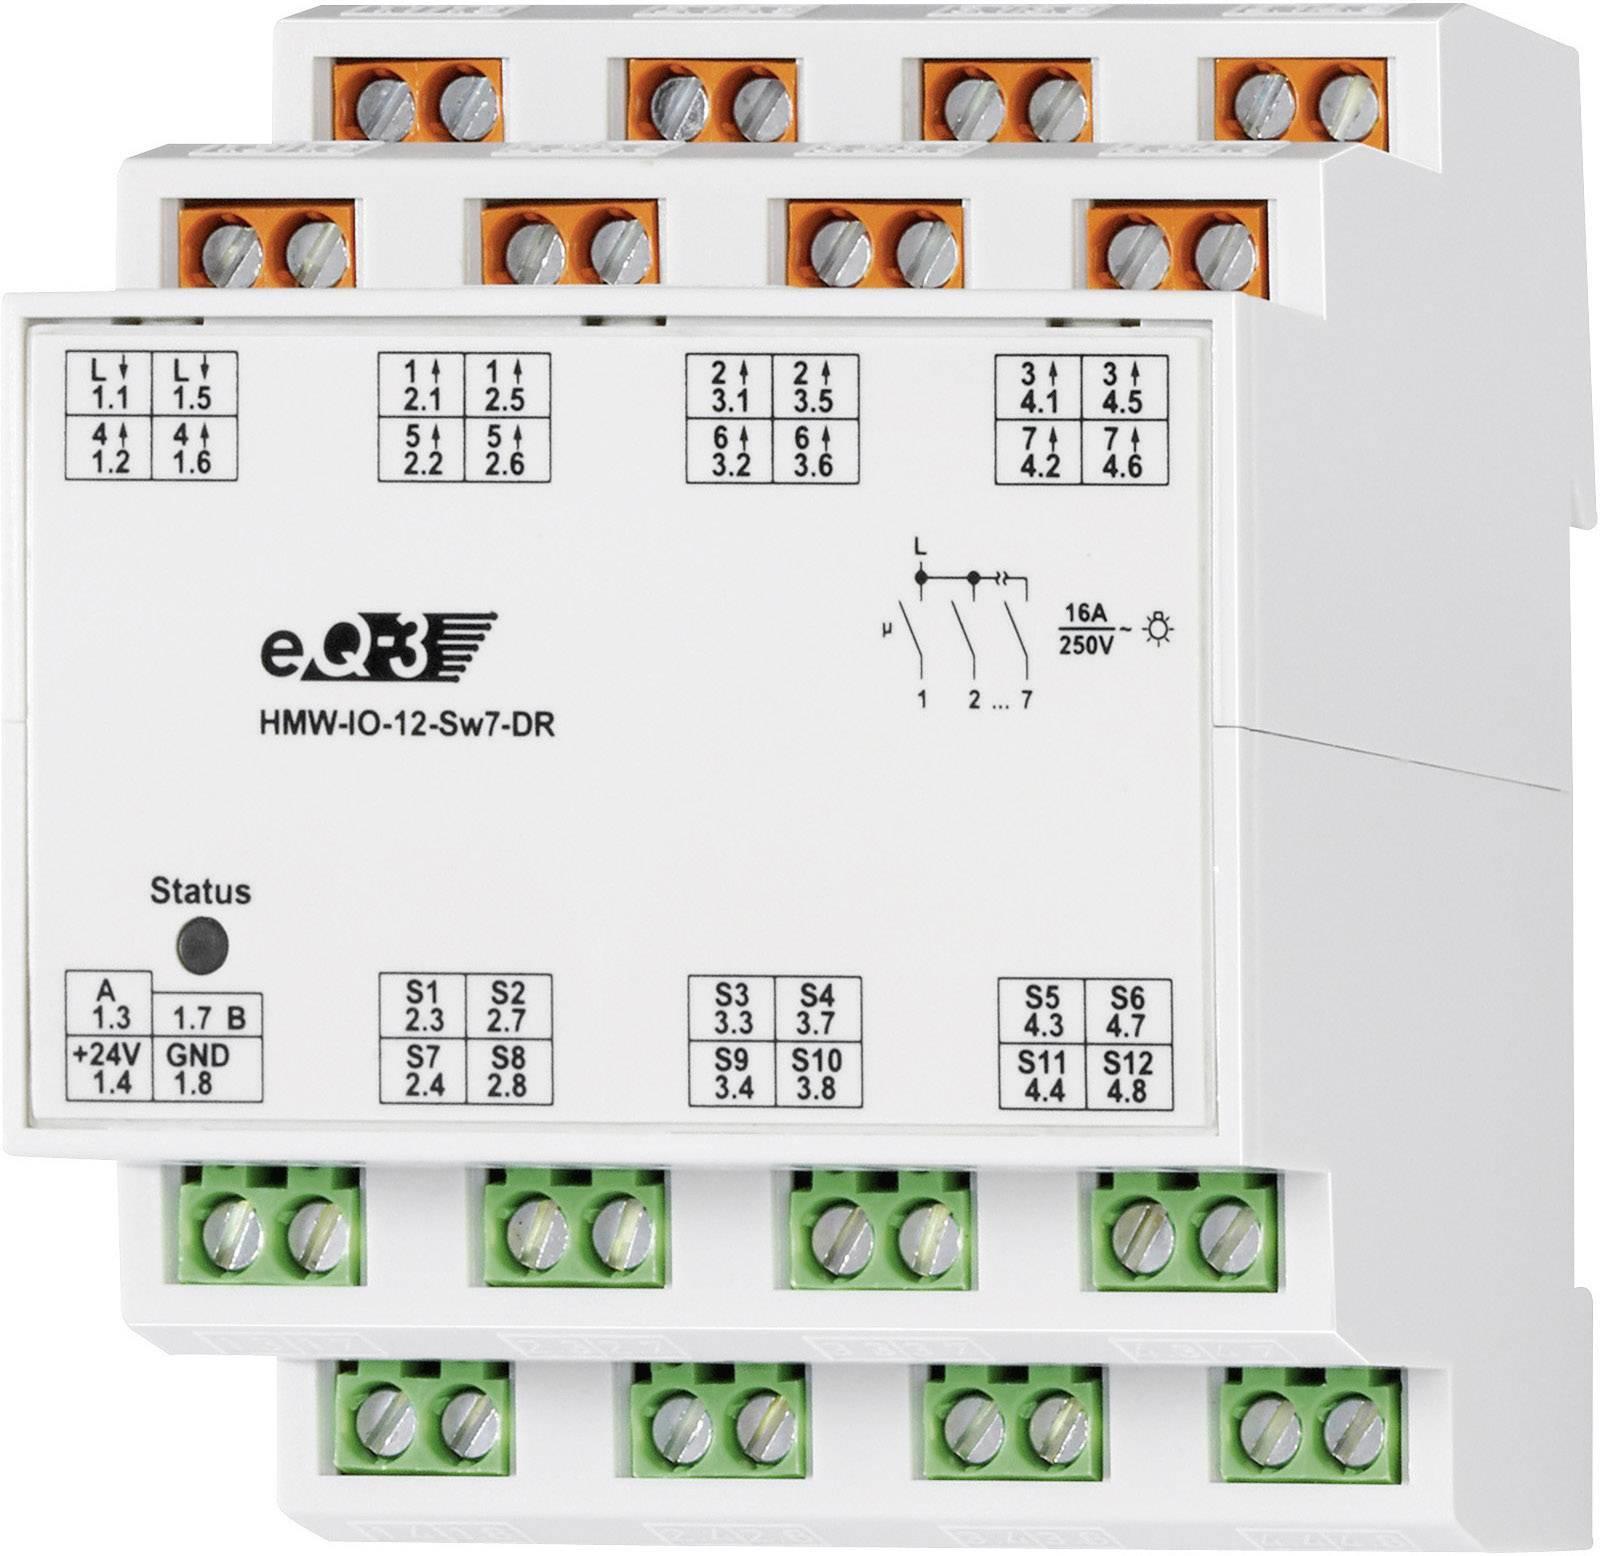 Spínací modul HomeMatic s 12 vstupmi a 7 výstupy